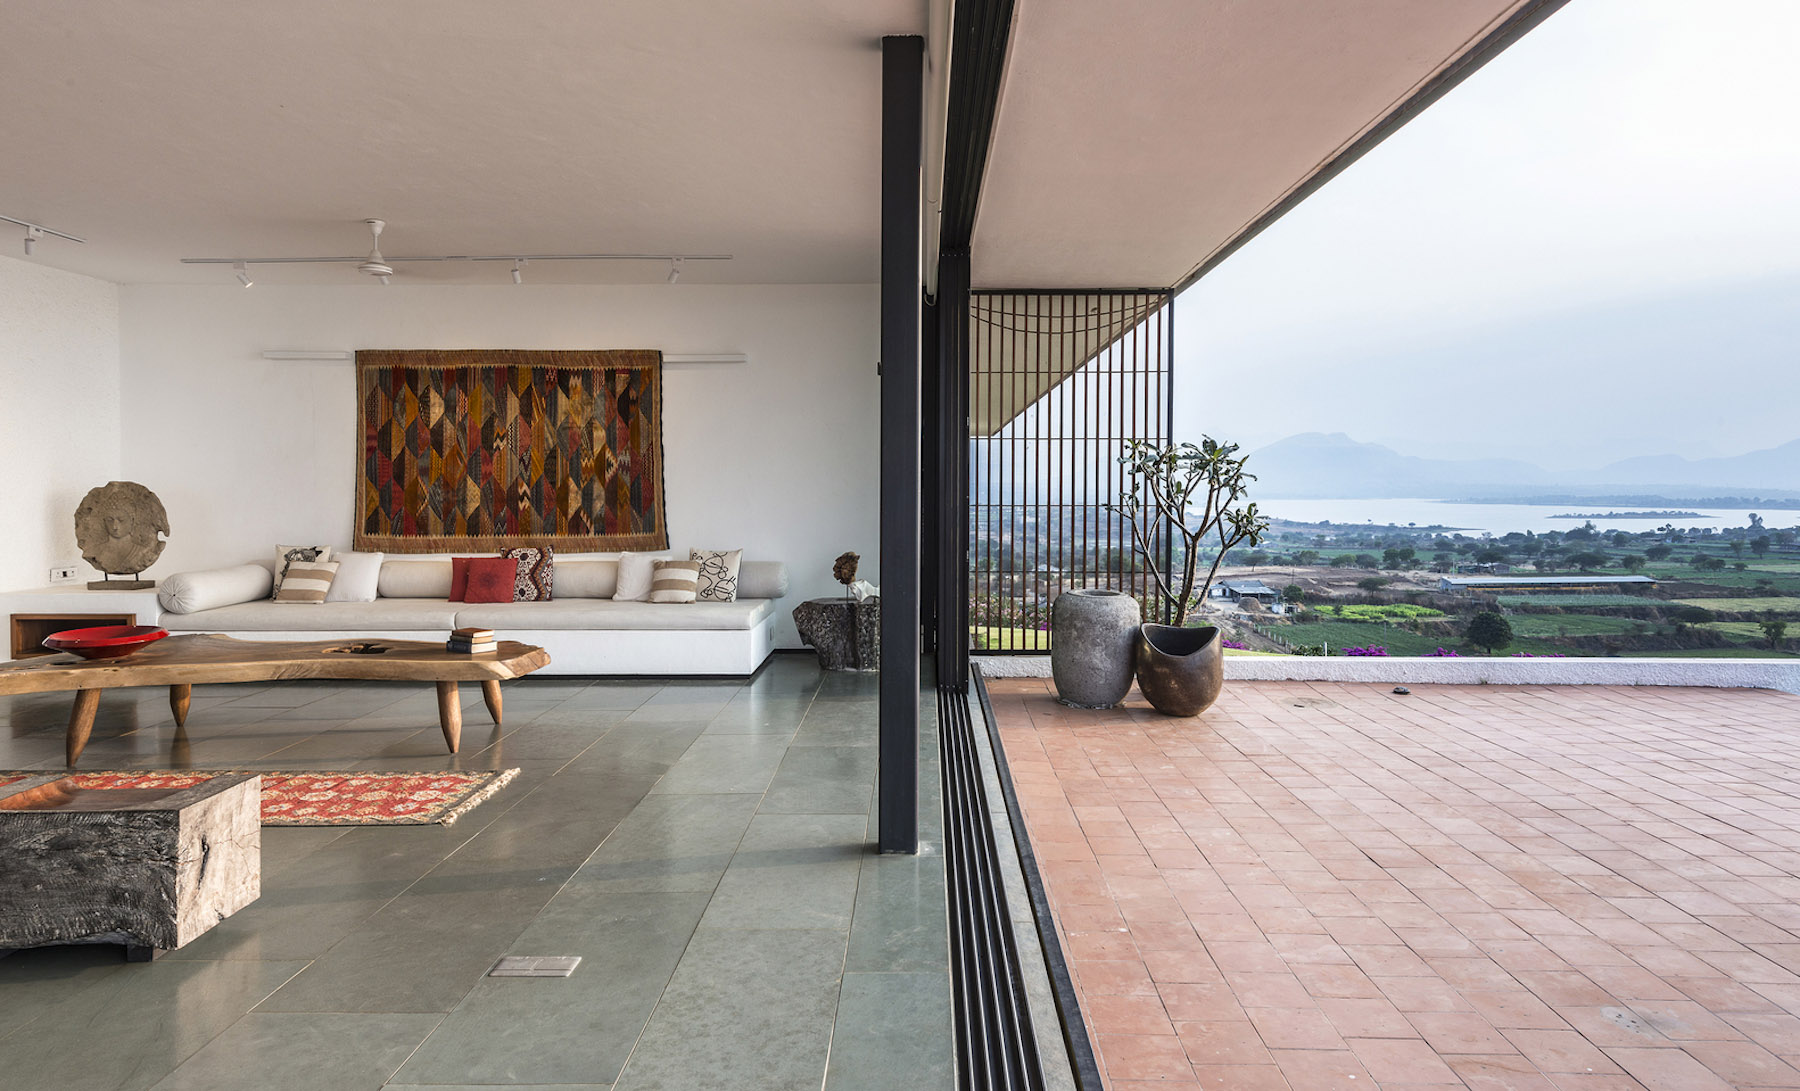 iGNANT-Architecture-Spasm-Design-The-Soaring-Rock-05